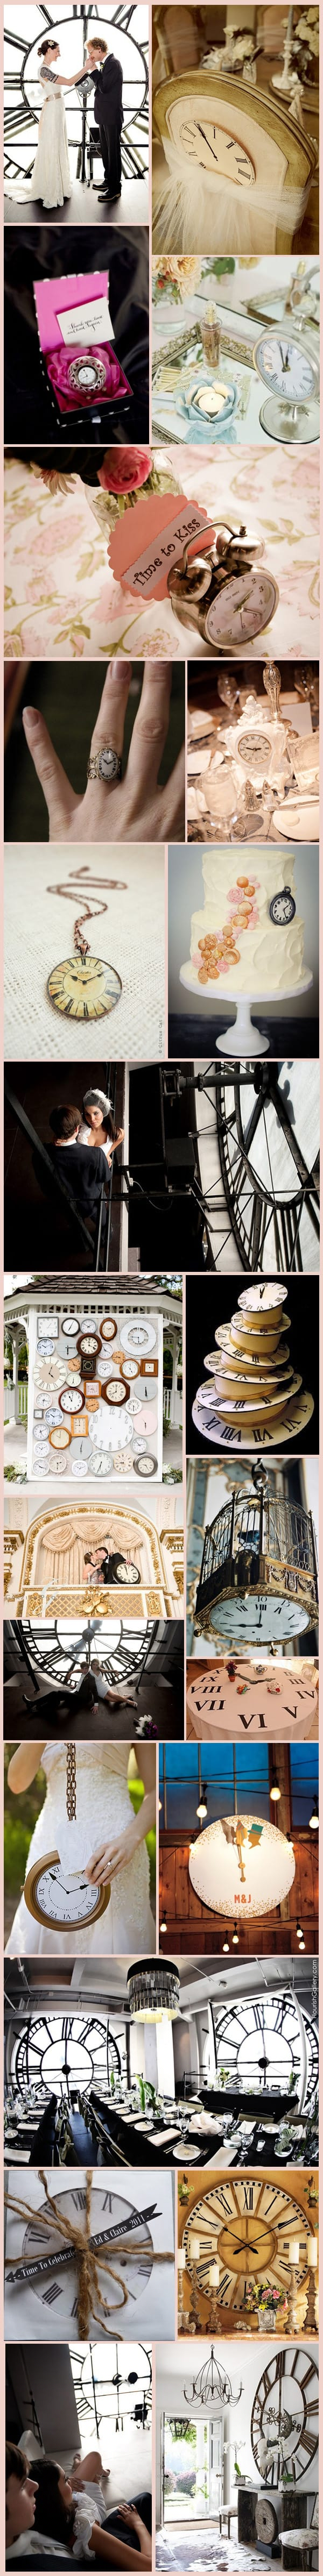 Clock Wedding Inspiration Board